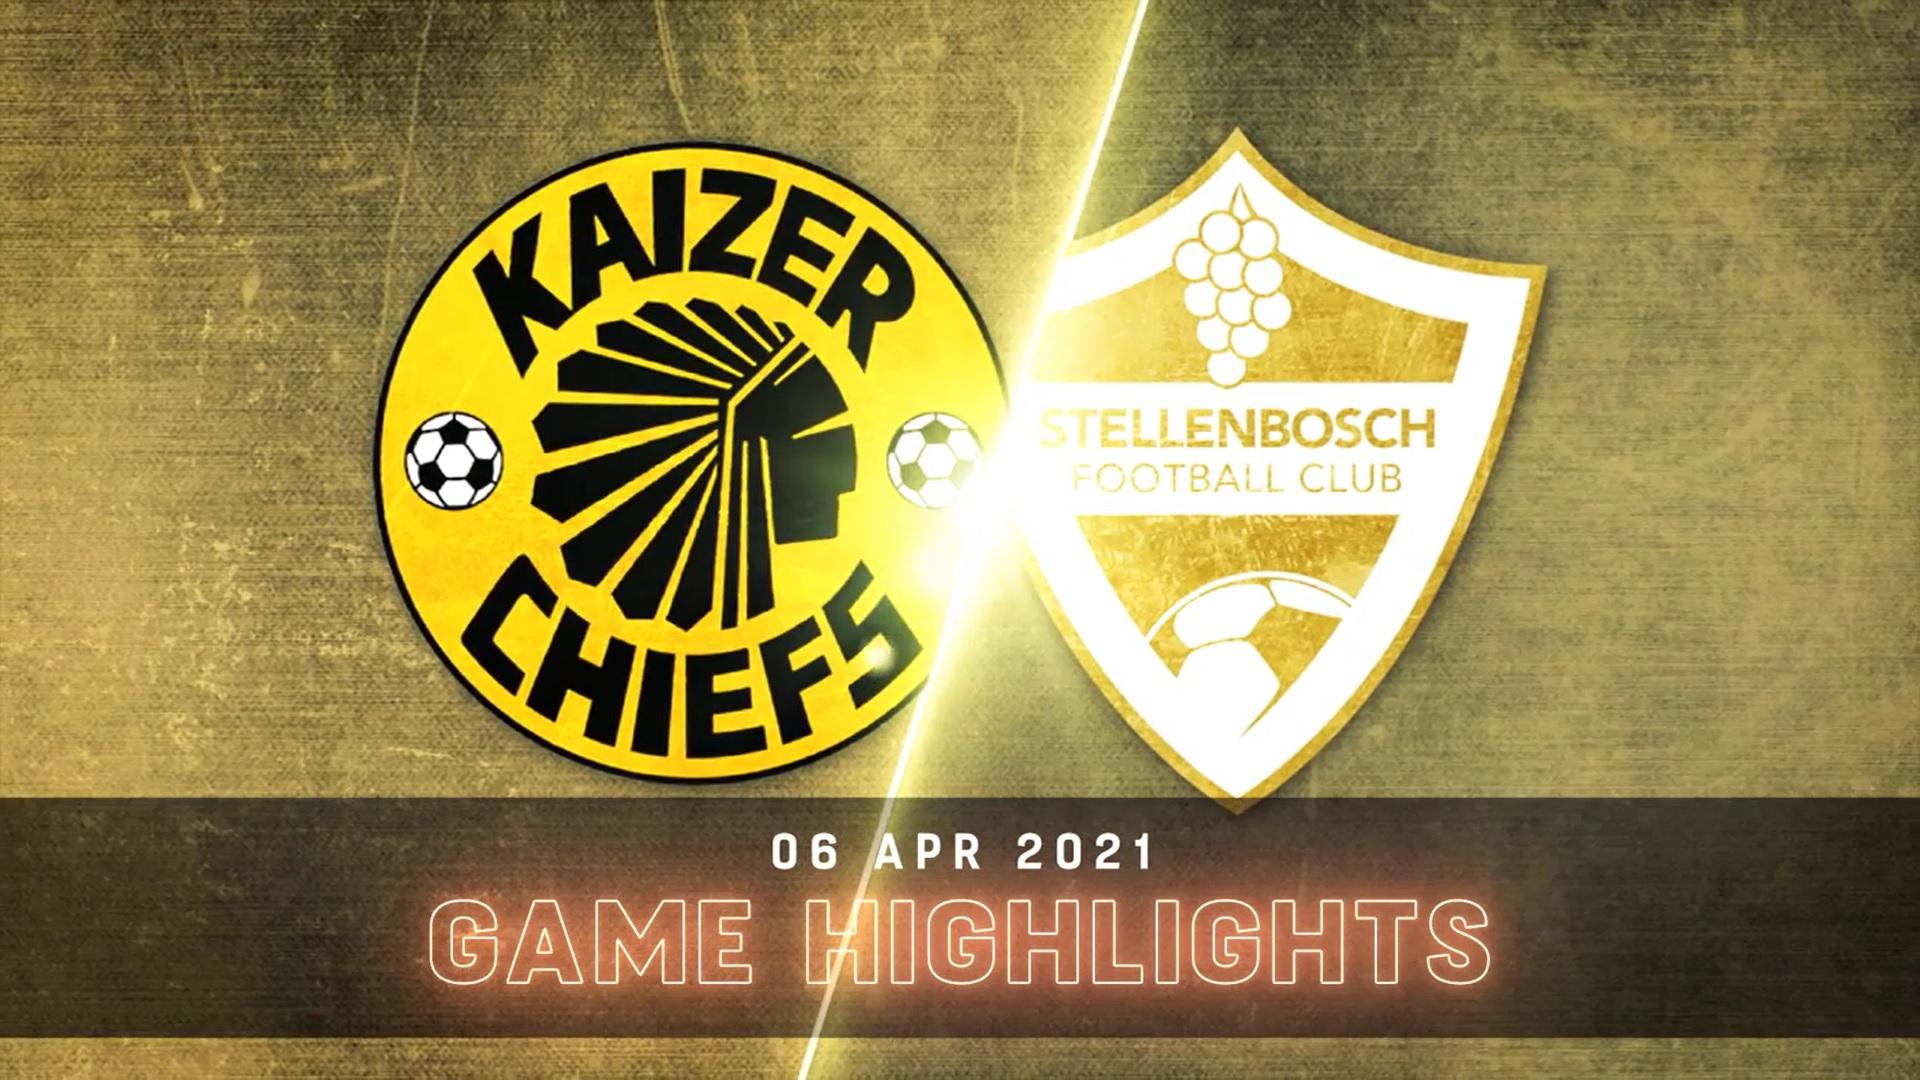 DStv Premiership I Kaizer Chiefs v Stellenbosch FC l Highlights